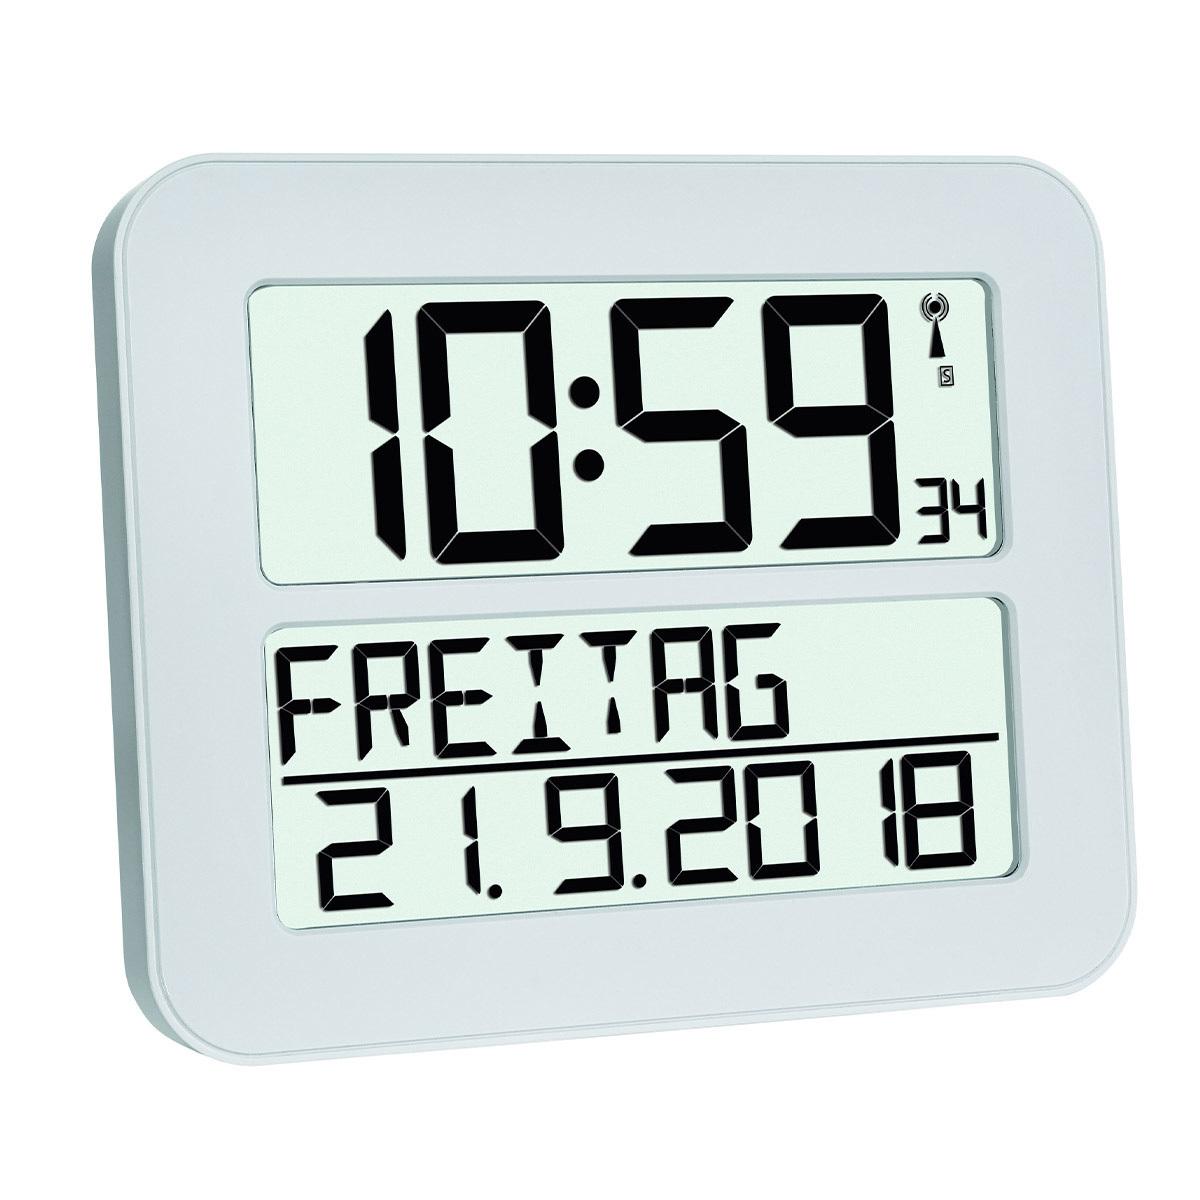 60-4512-02-digitale-funkuhr-timeline-max-1200x1200px.jpg